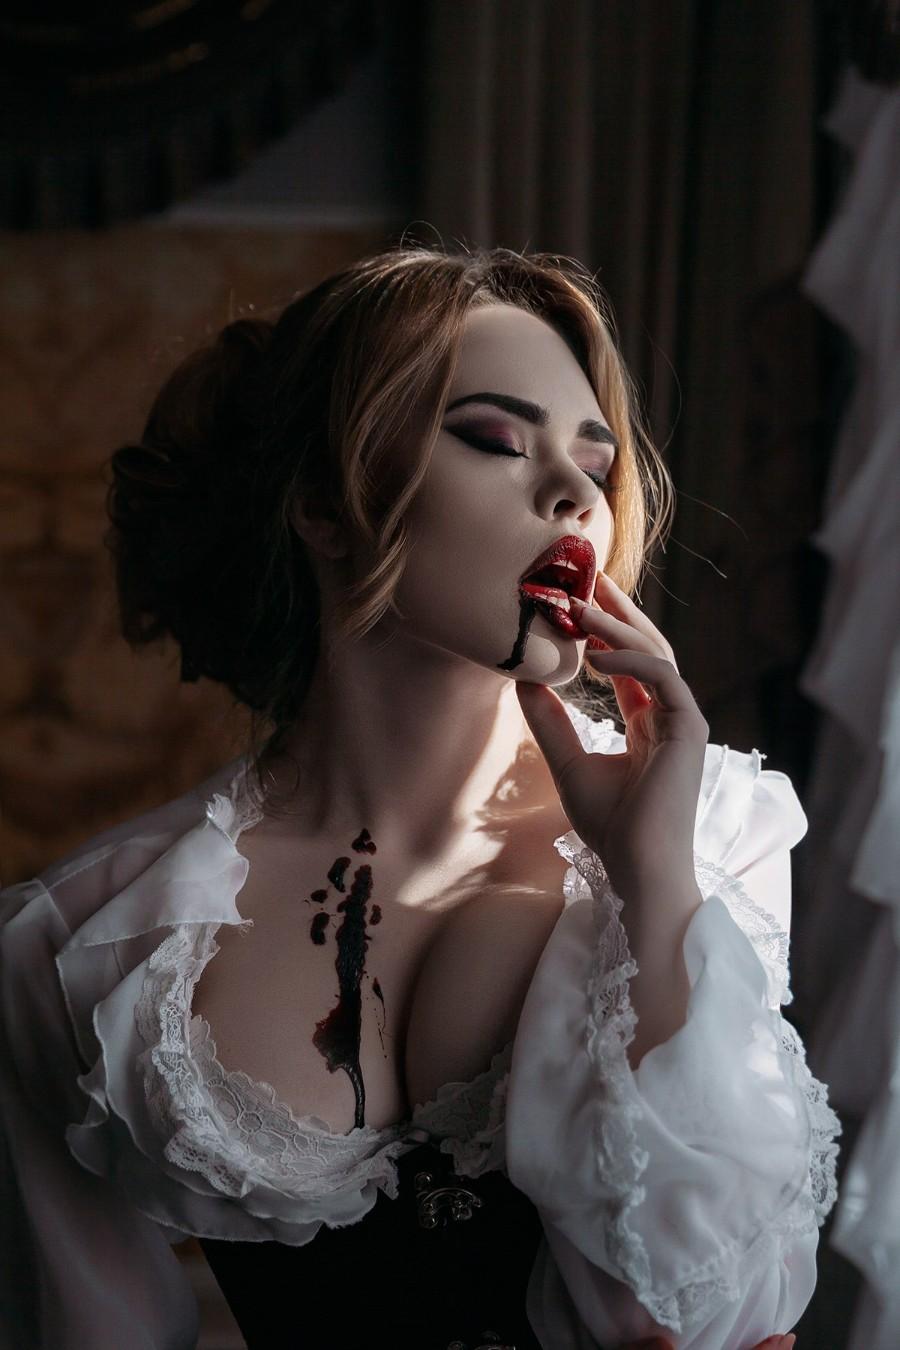 vampire-sexy-girl-bi-three-sum-porn